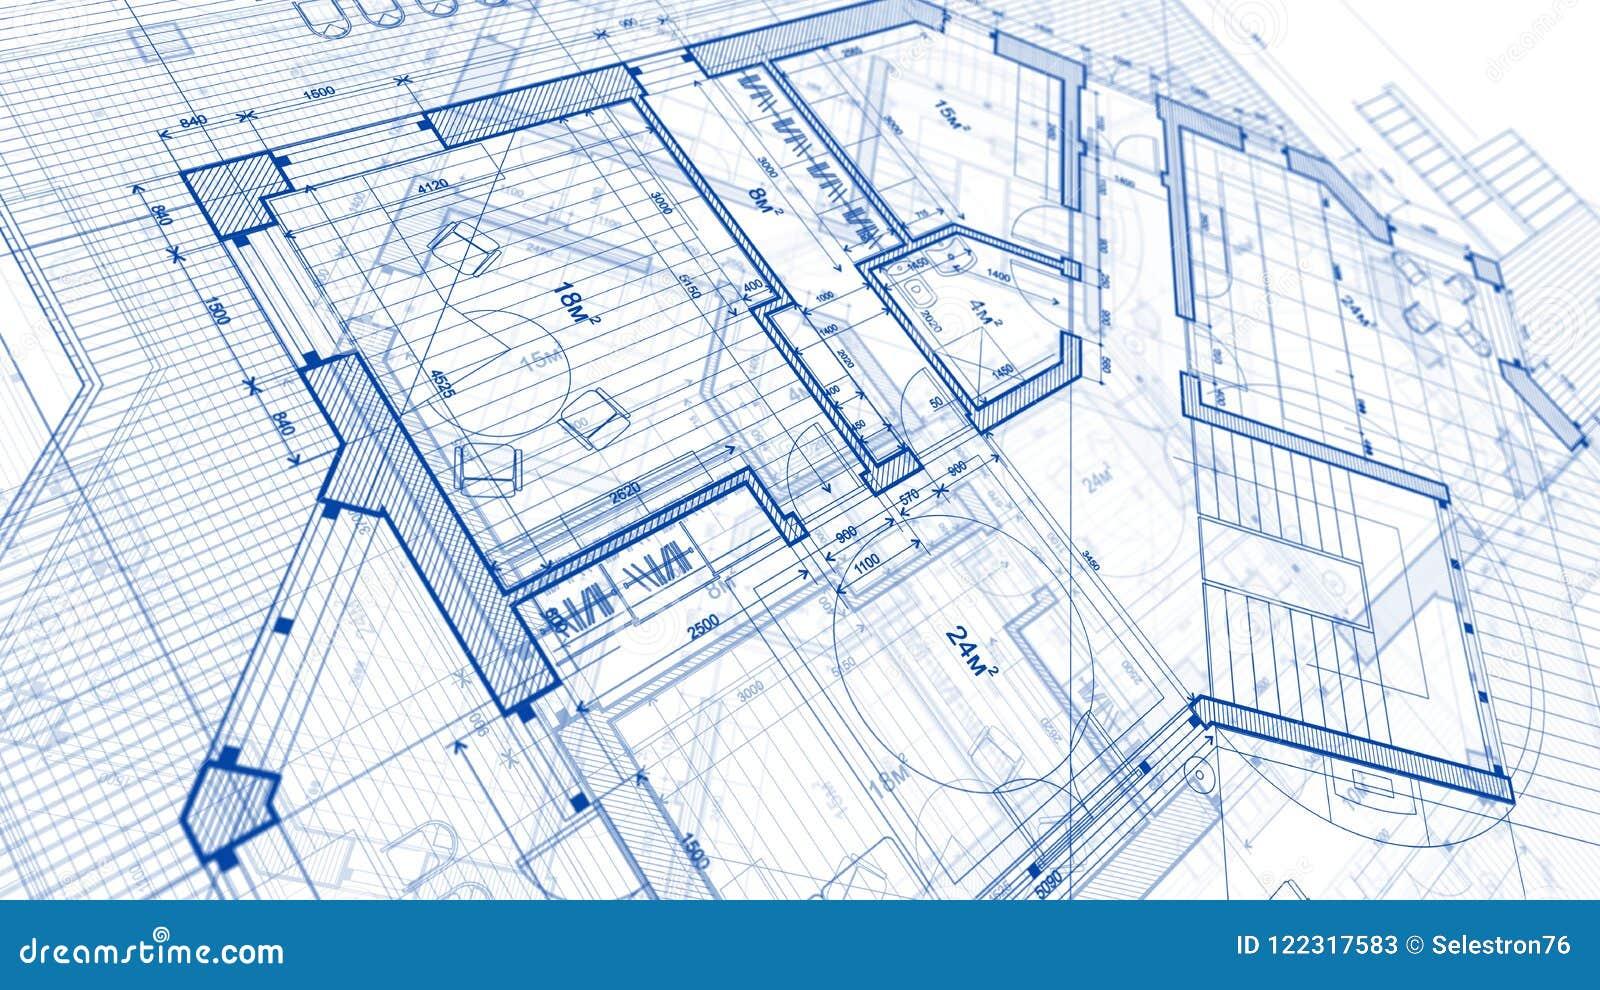 Image of: Architecture Design Blueprint Intended Architecture Design Blueprint Plan Illustration Of Mod Design Blueprint Plan Illustration Of Mod